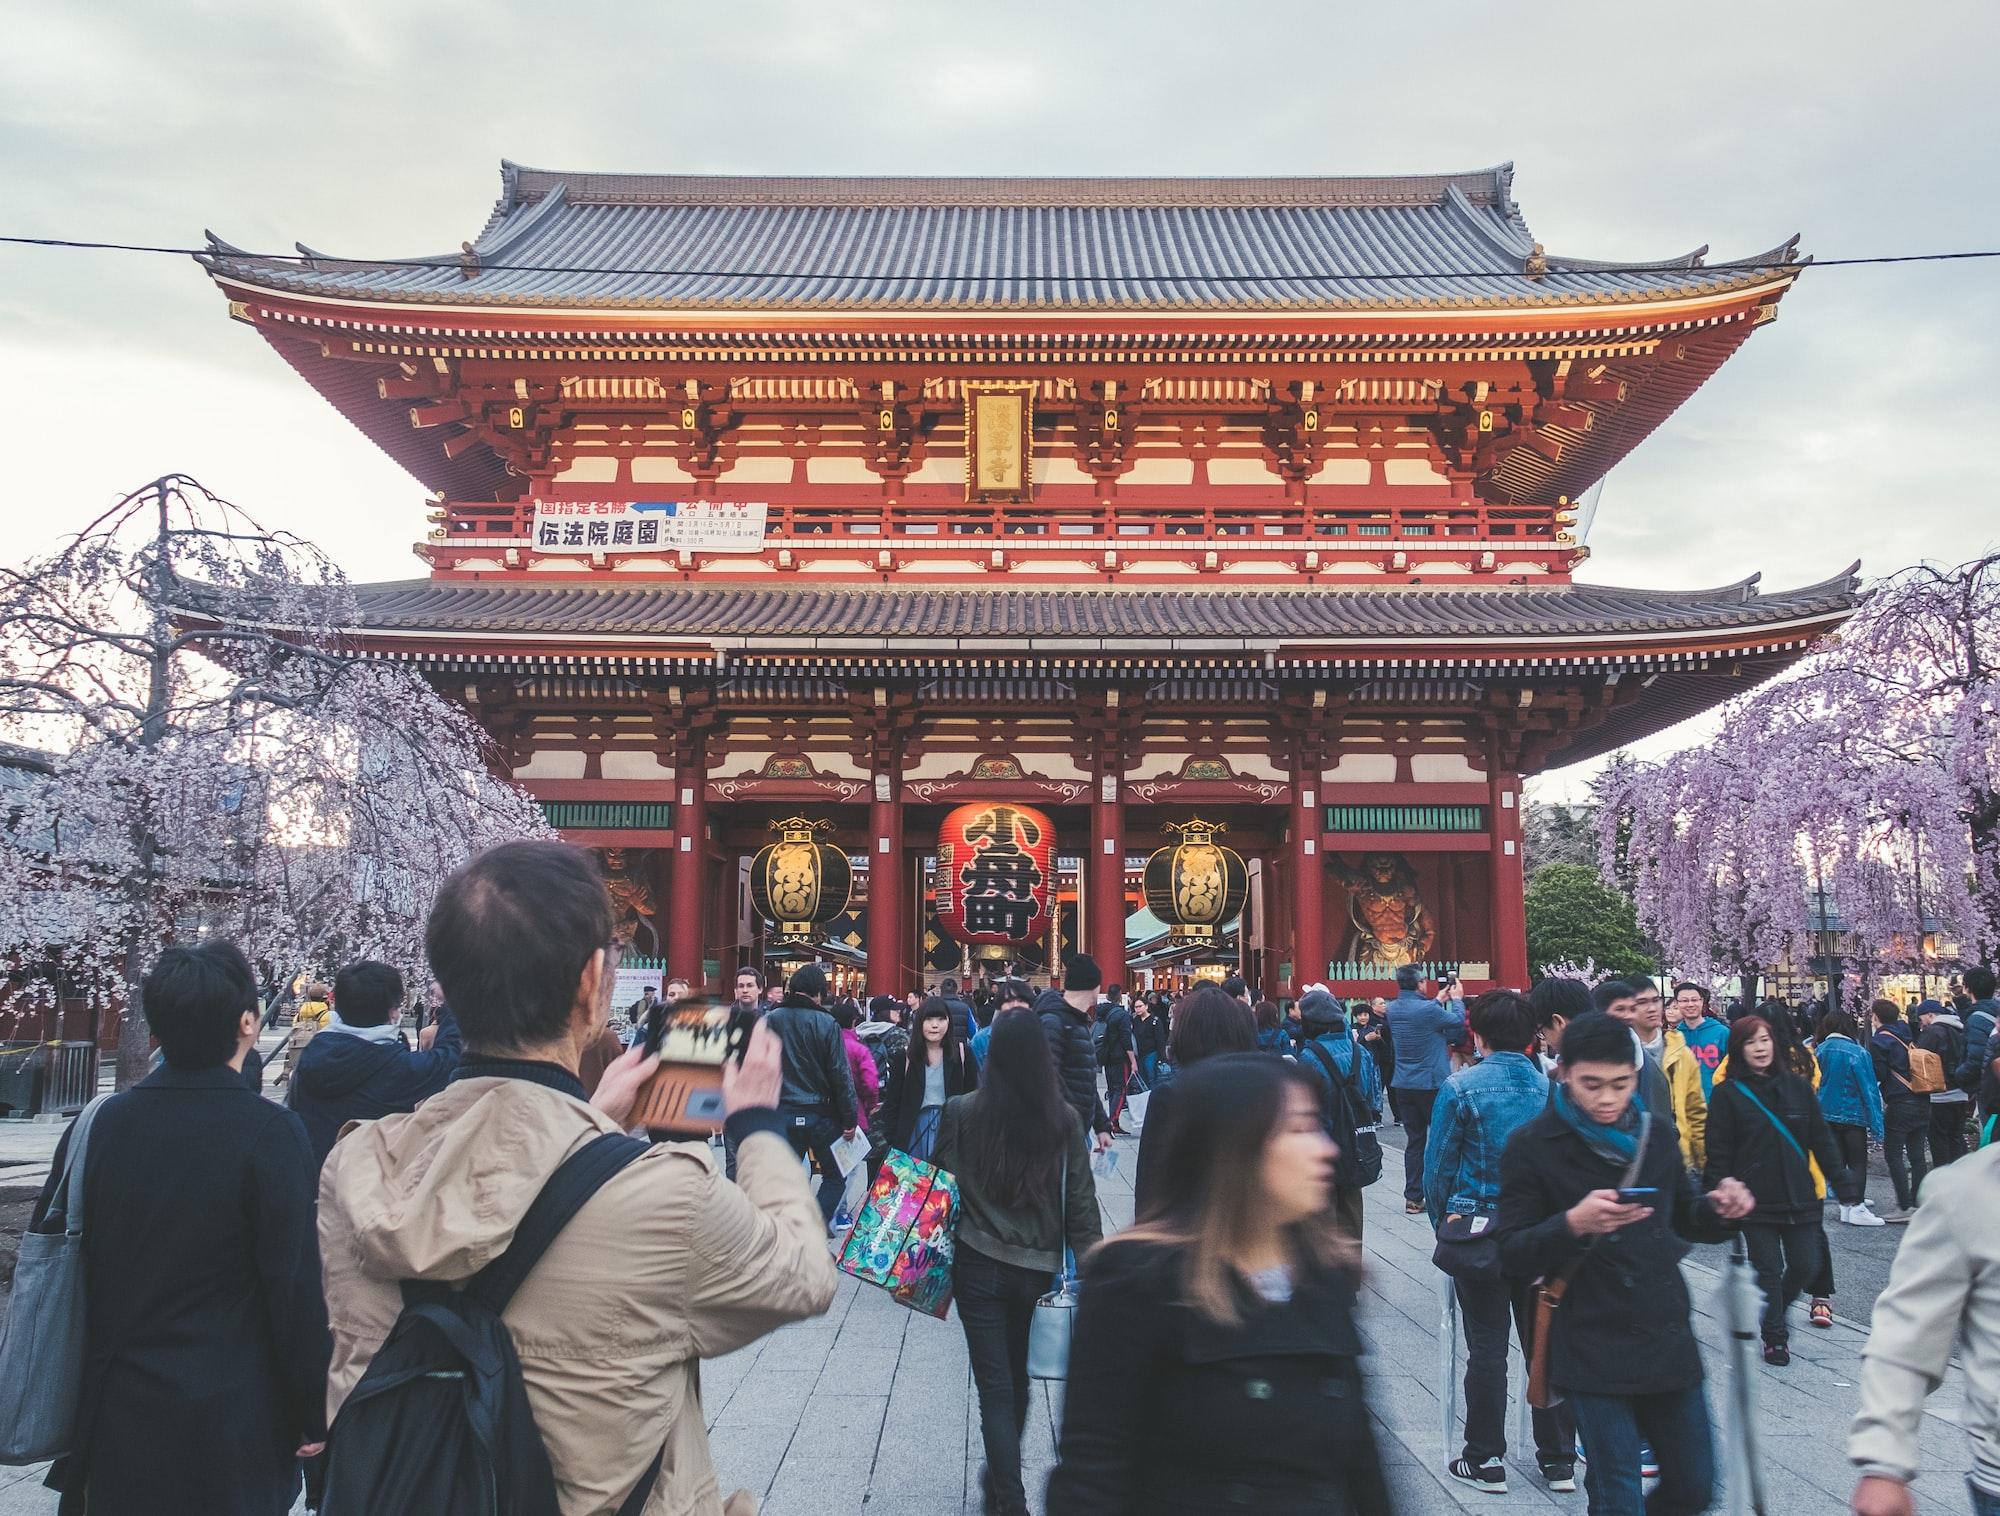 Senso-ji temple in Asakusa (Tokyo)